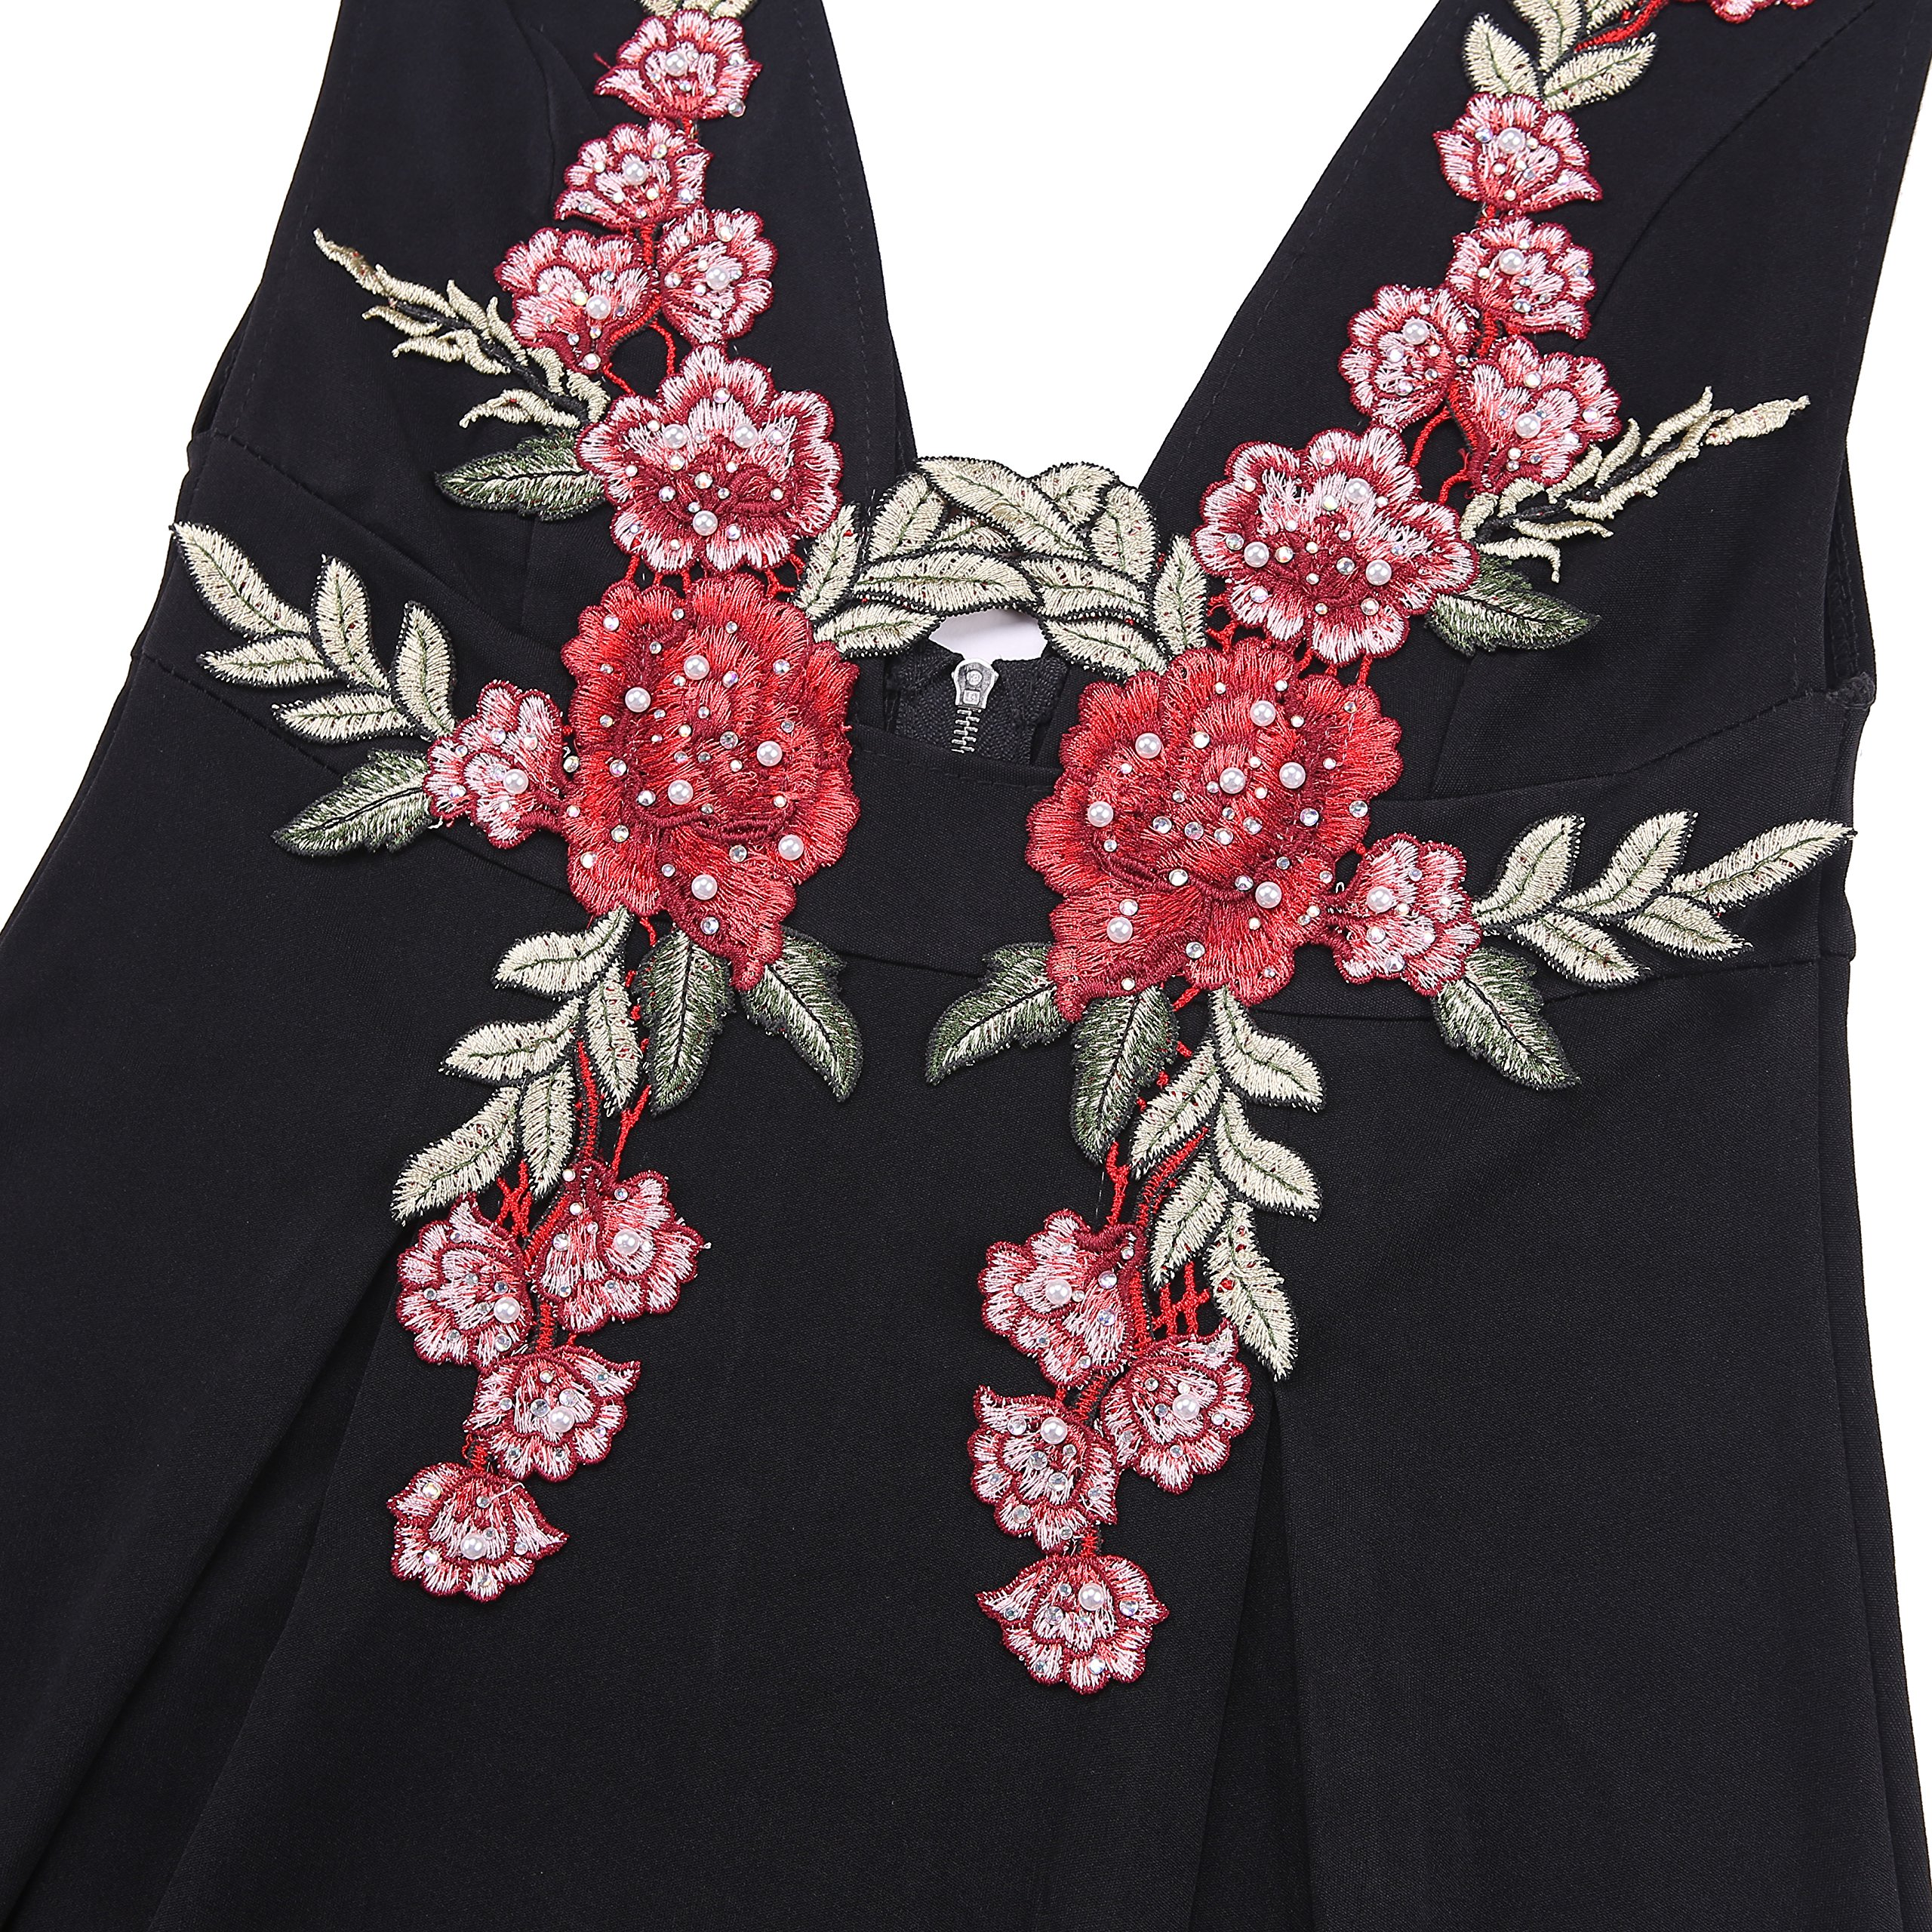 Goddess Area Women\'s Deep V Neck High Waist A Line Flower Print Cocktail Vintage Midi Dress (L, Black)